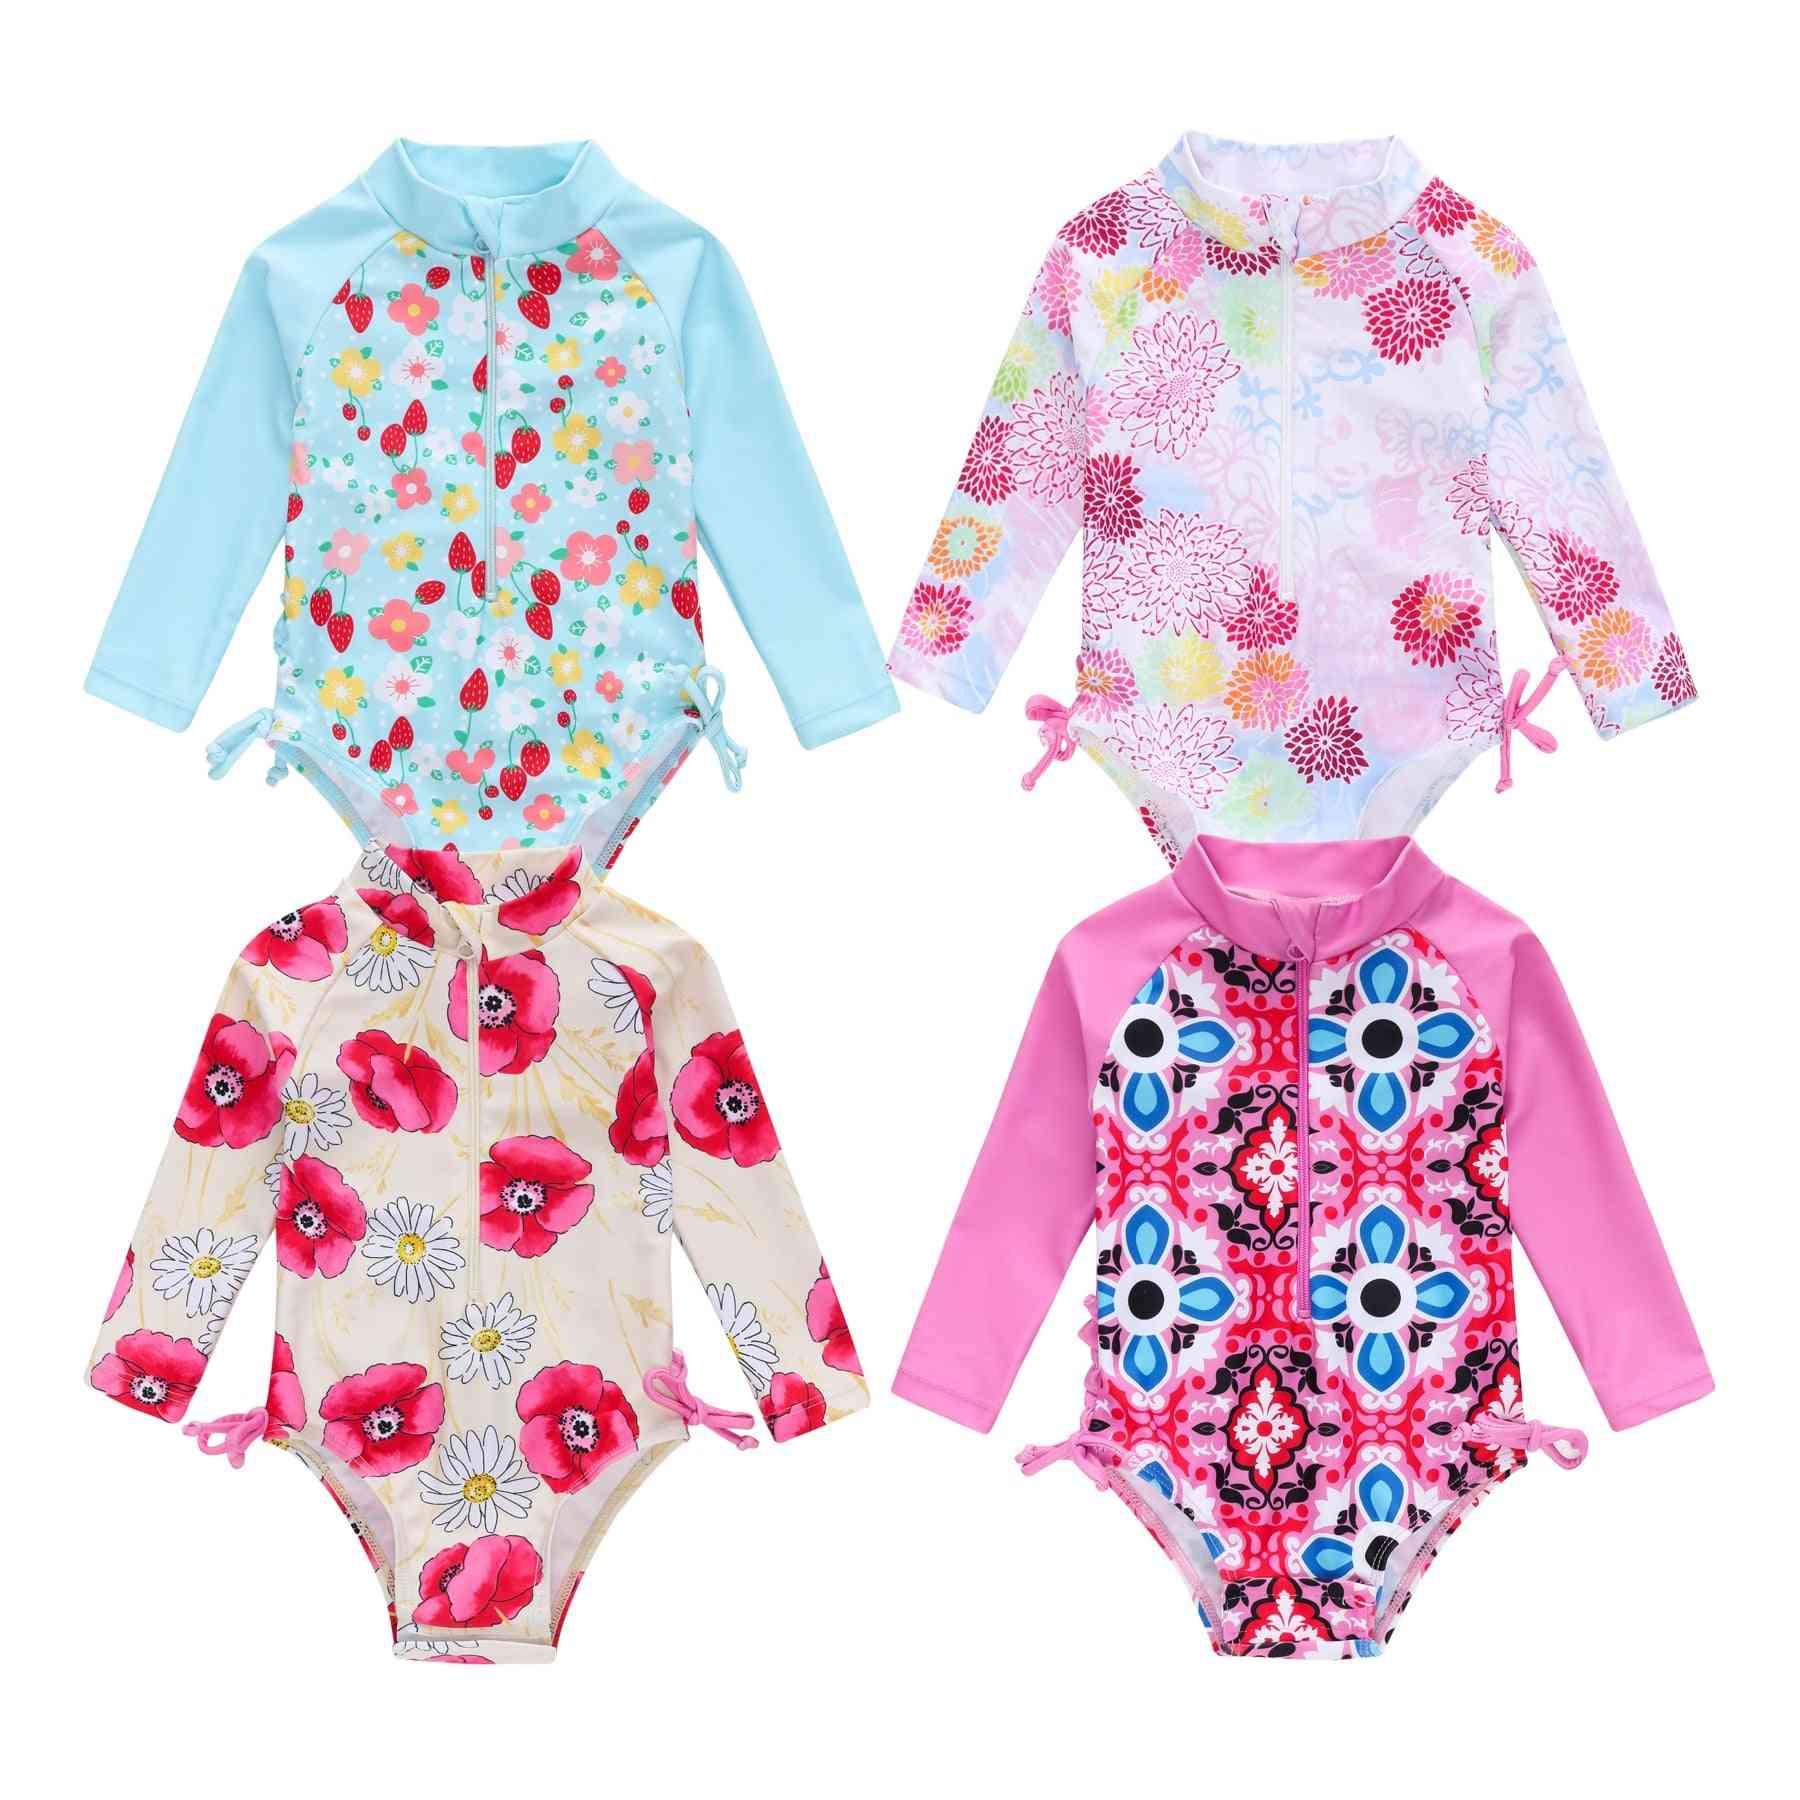 Infant Baby Girl Summer Swimsuit, Cute Long Sleeve Floral Swimwear Swimming & Bikini